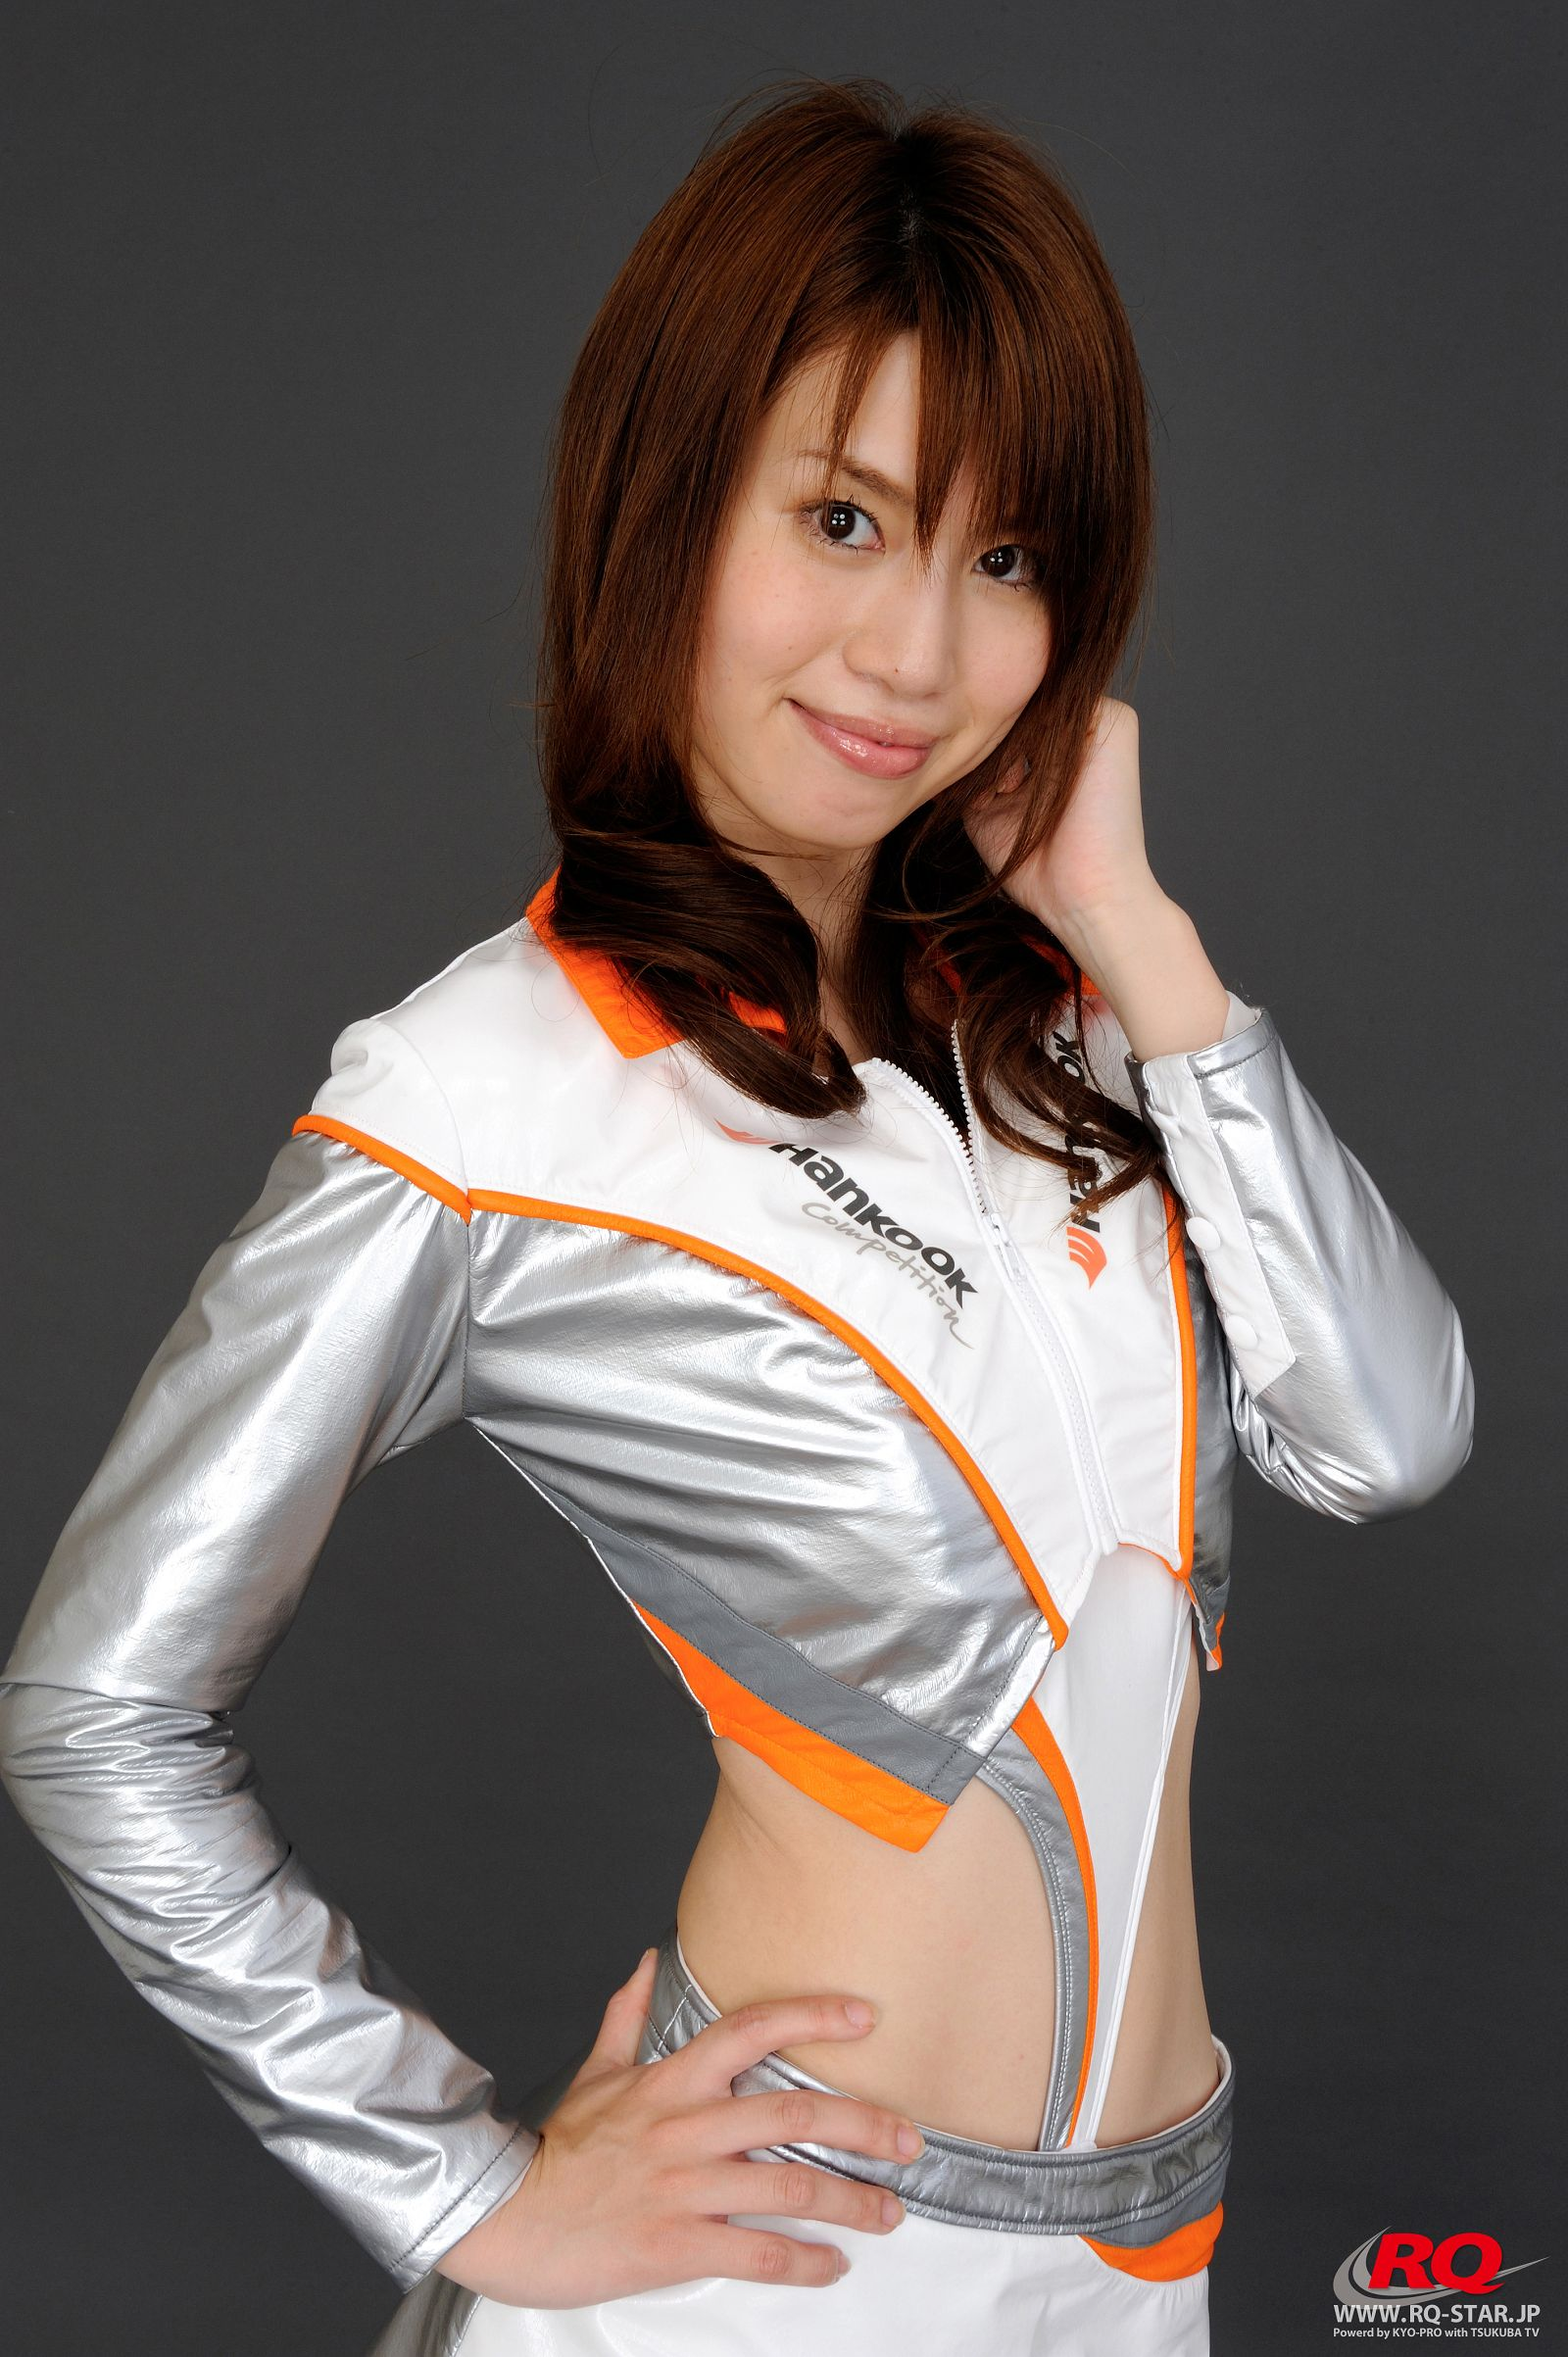 [RQ STAR美女] NO.0007 Aki Kogure 小暮あき Race Queen 2008 Hankook[111P] RQ STAR 第2张